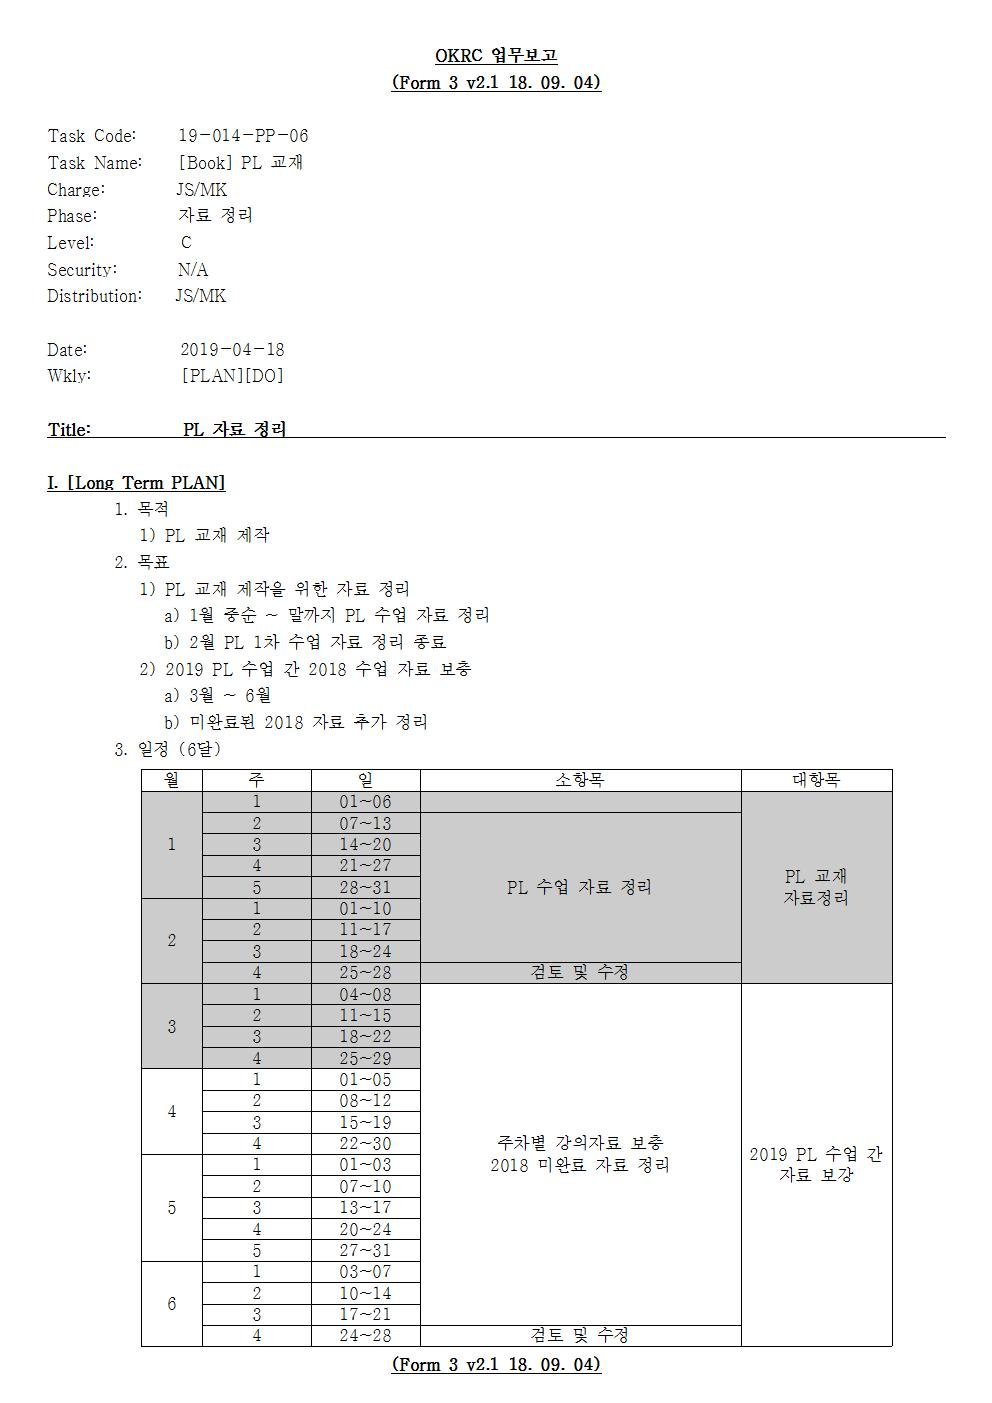 D-[19-014-PP-06]-[Book-PL]-[2019-04-18][JS]001.jpg